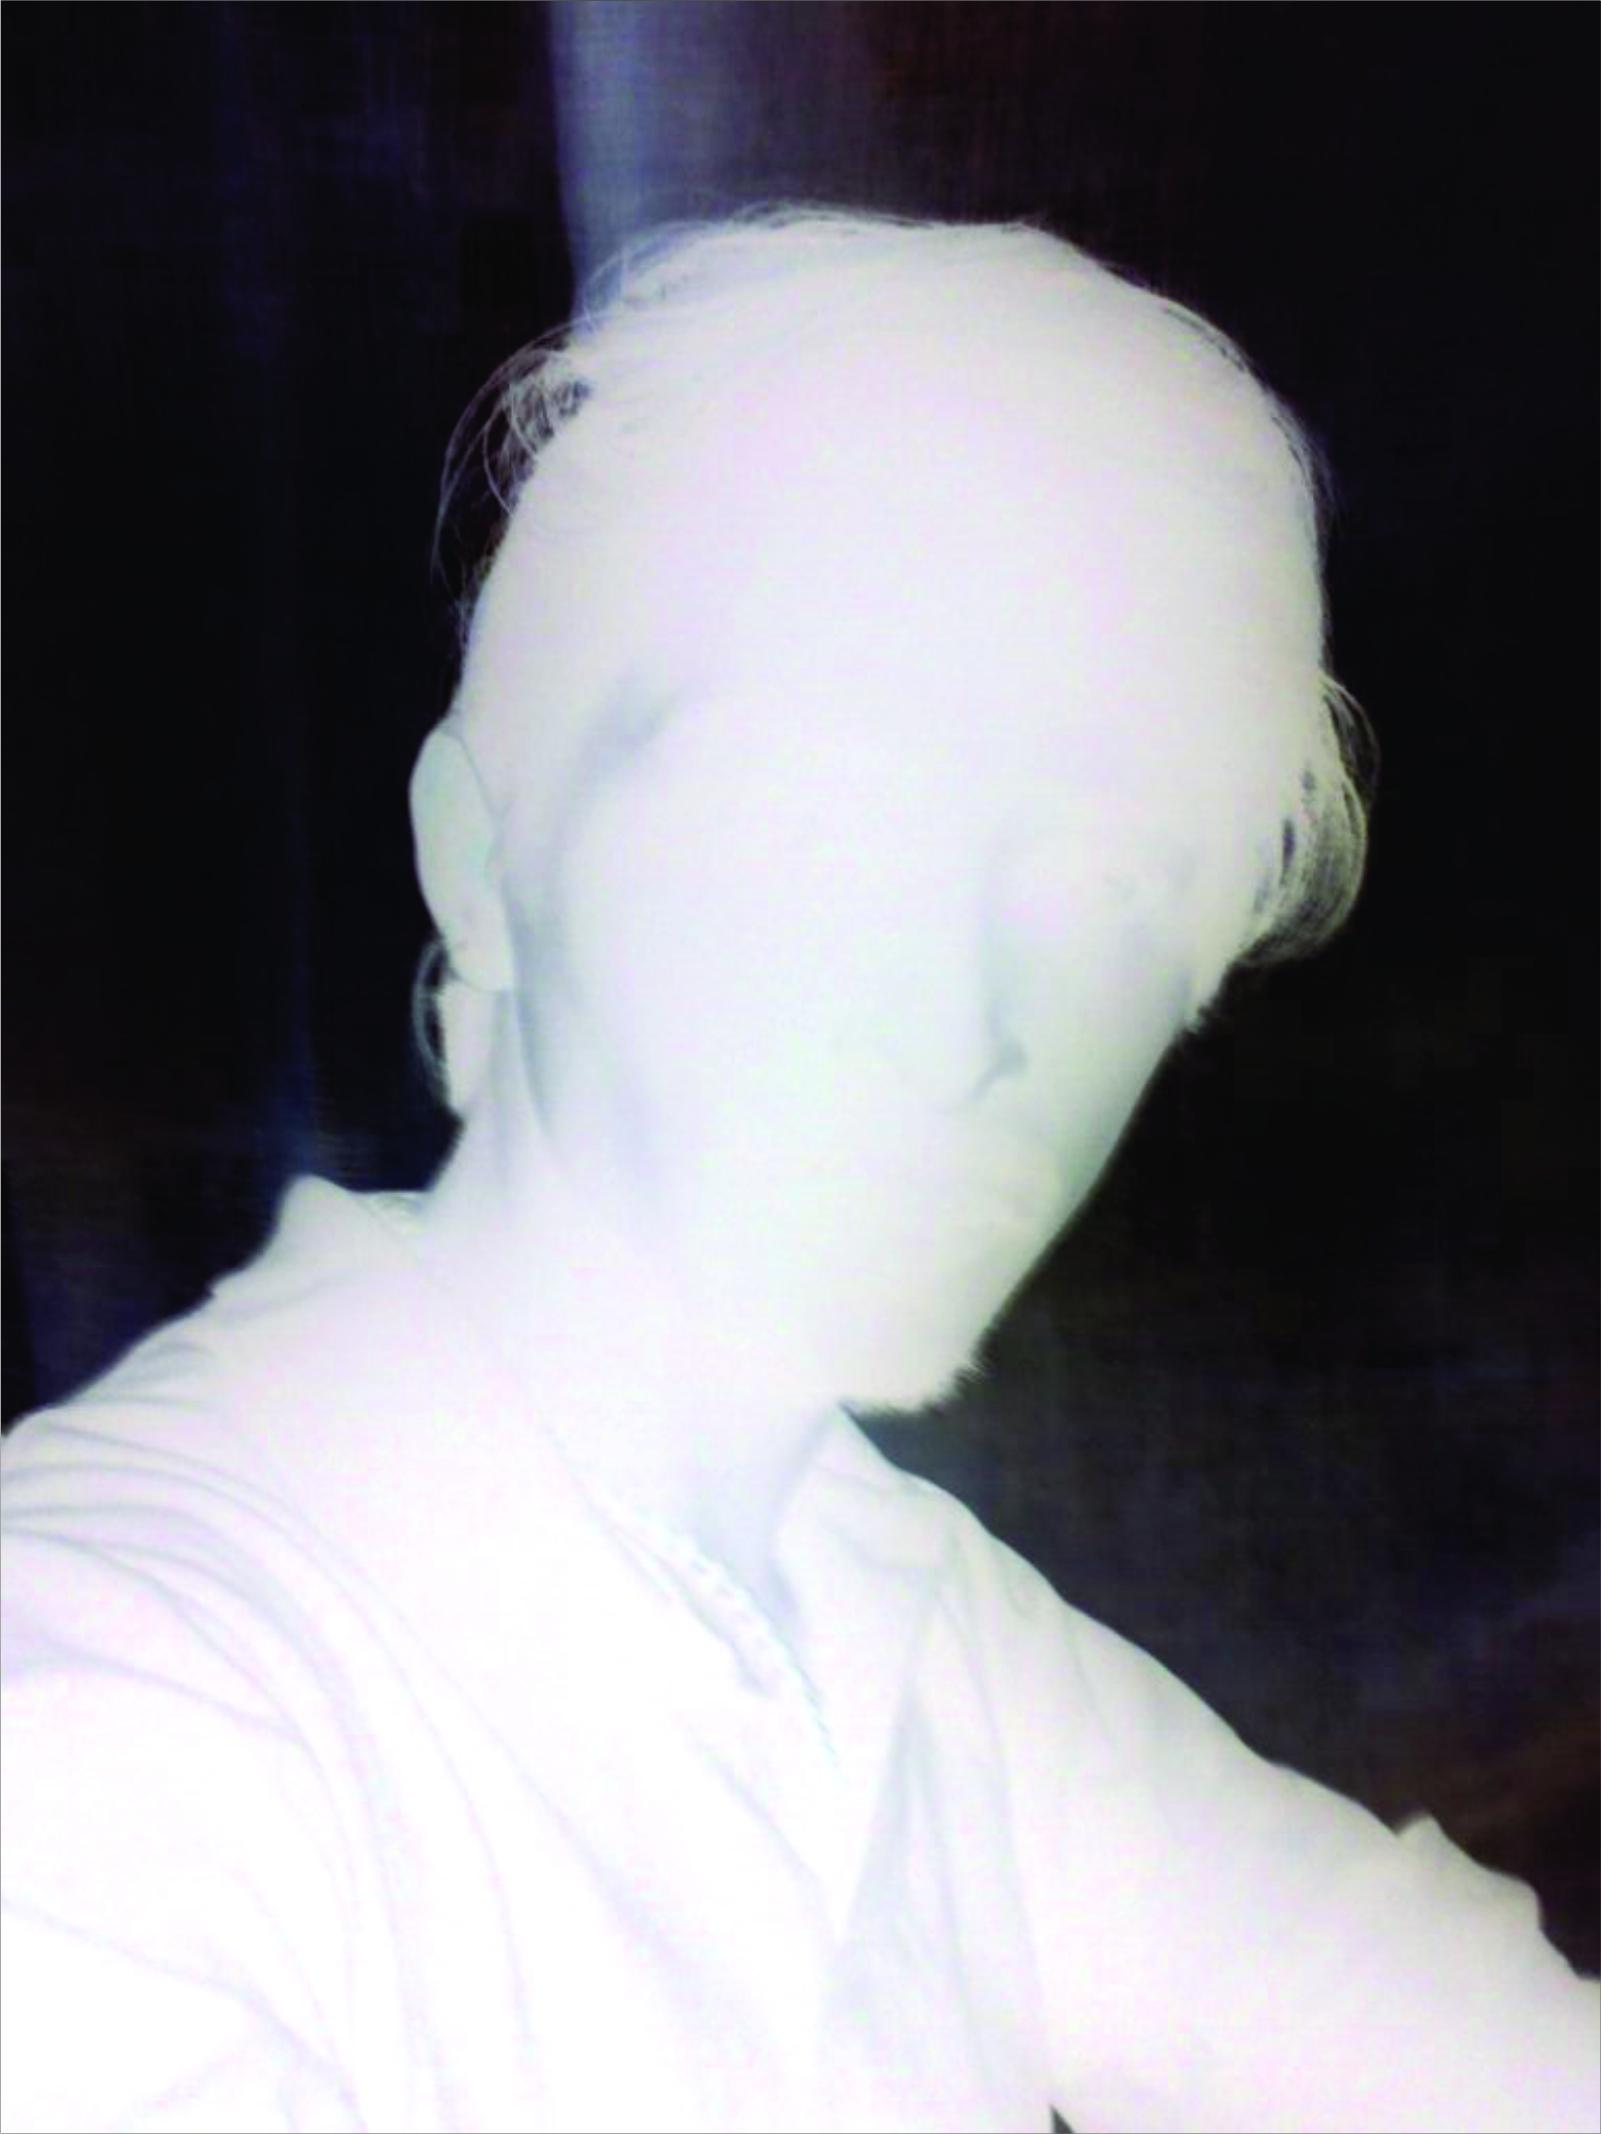 busto silueta invertido